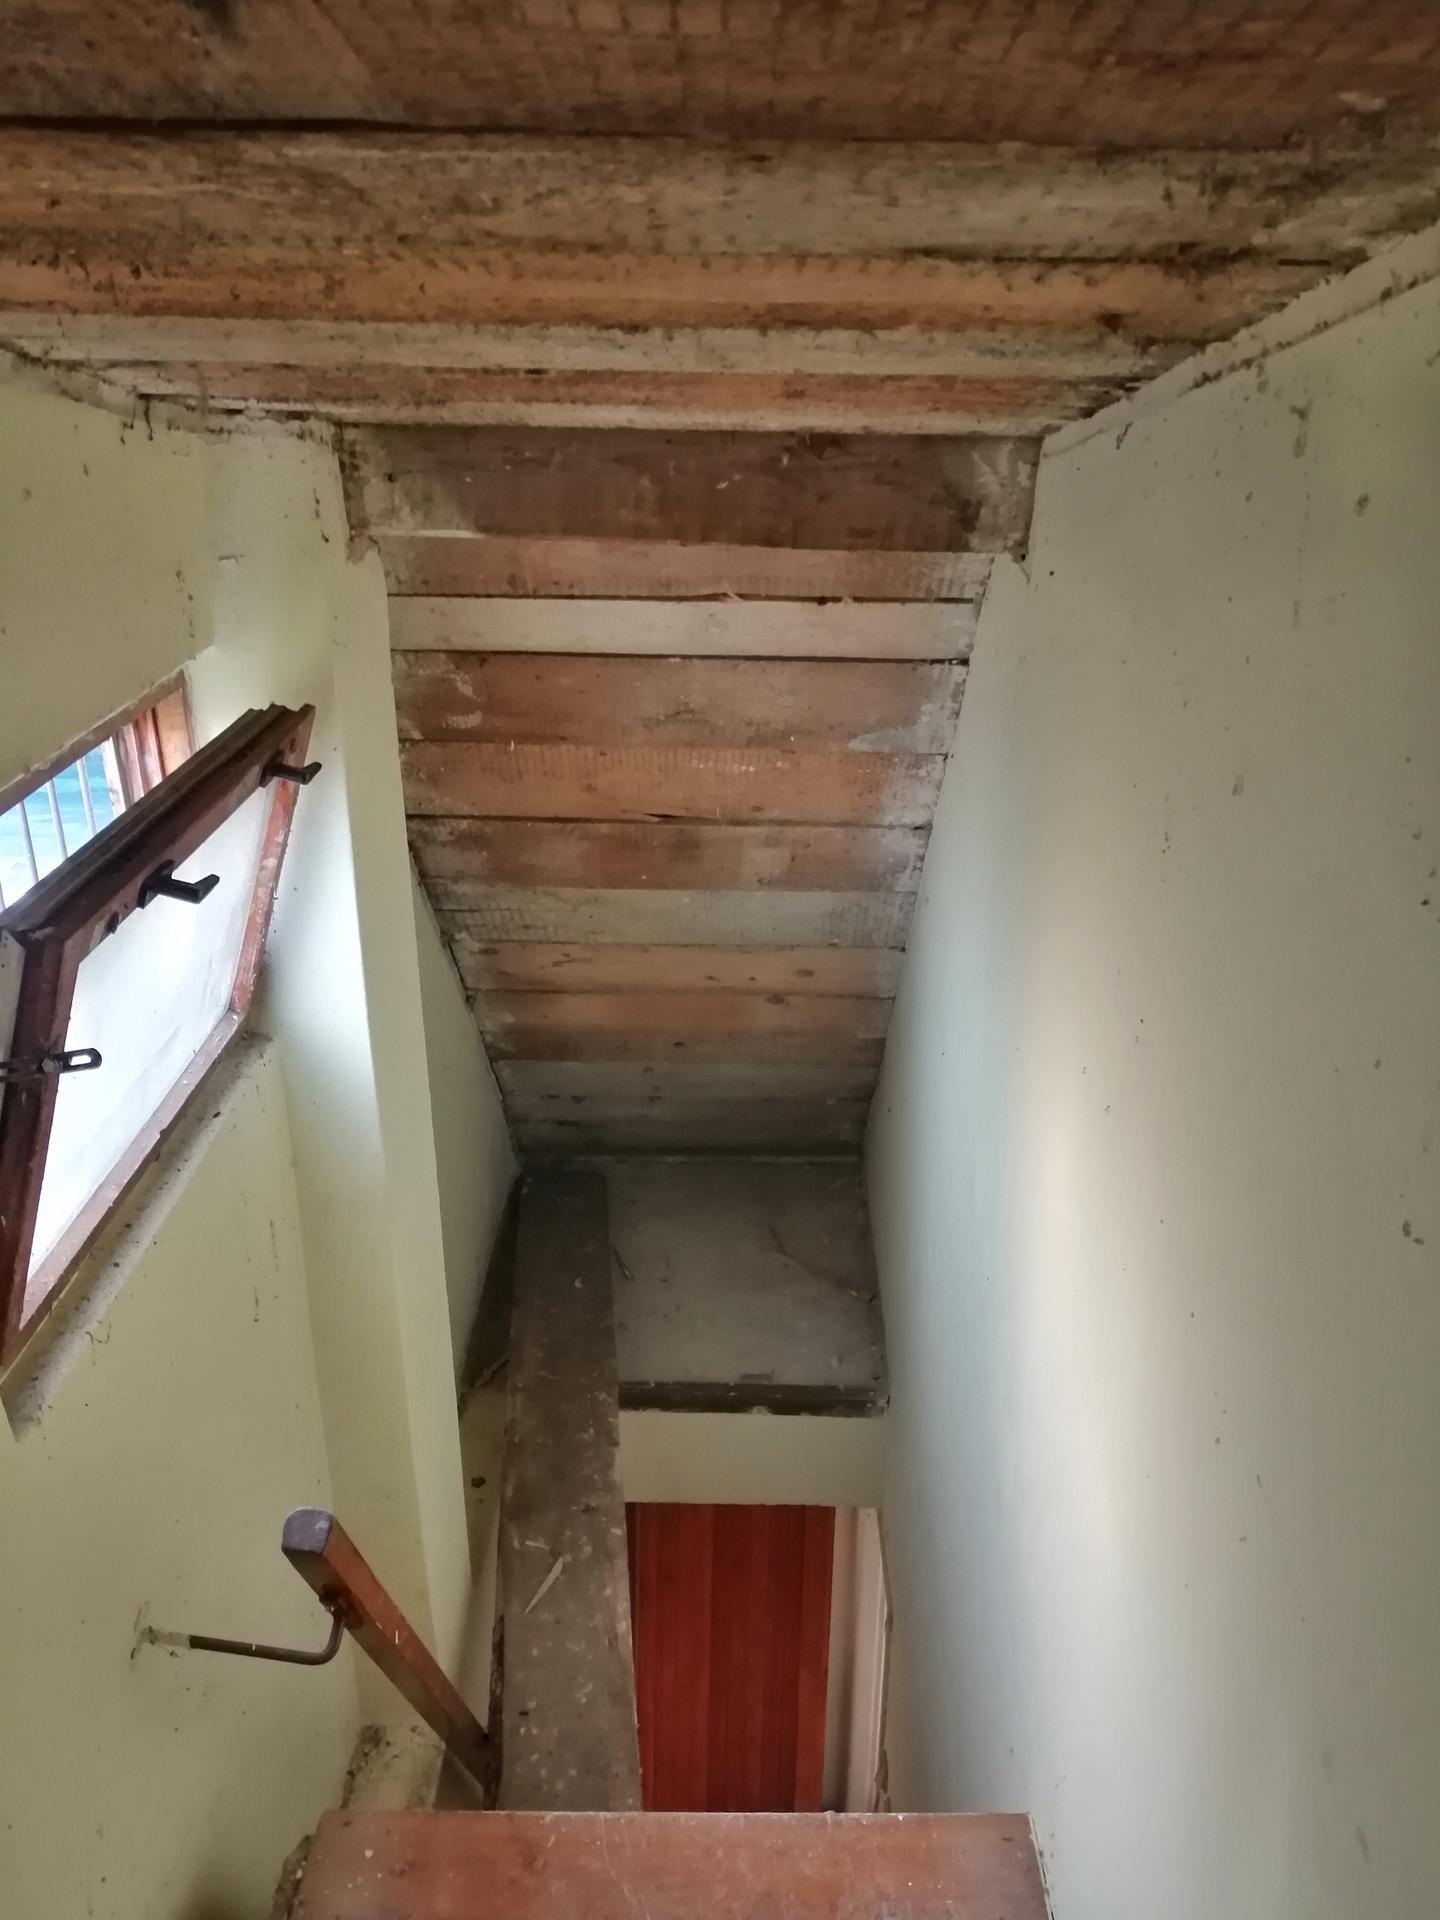 Prestavba podkrovia zo sedlovo valbovej na sedlovú strechu. - Obrázok č. 22